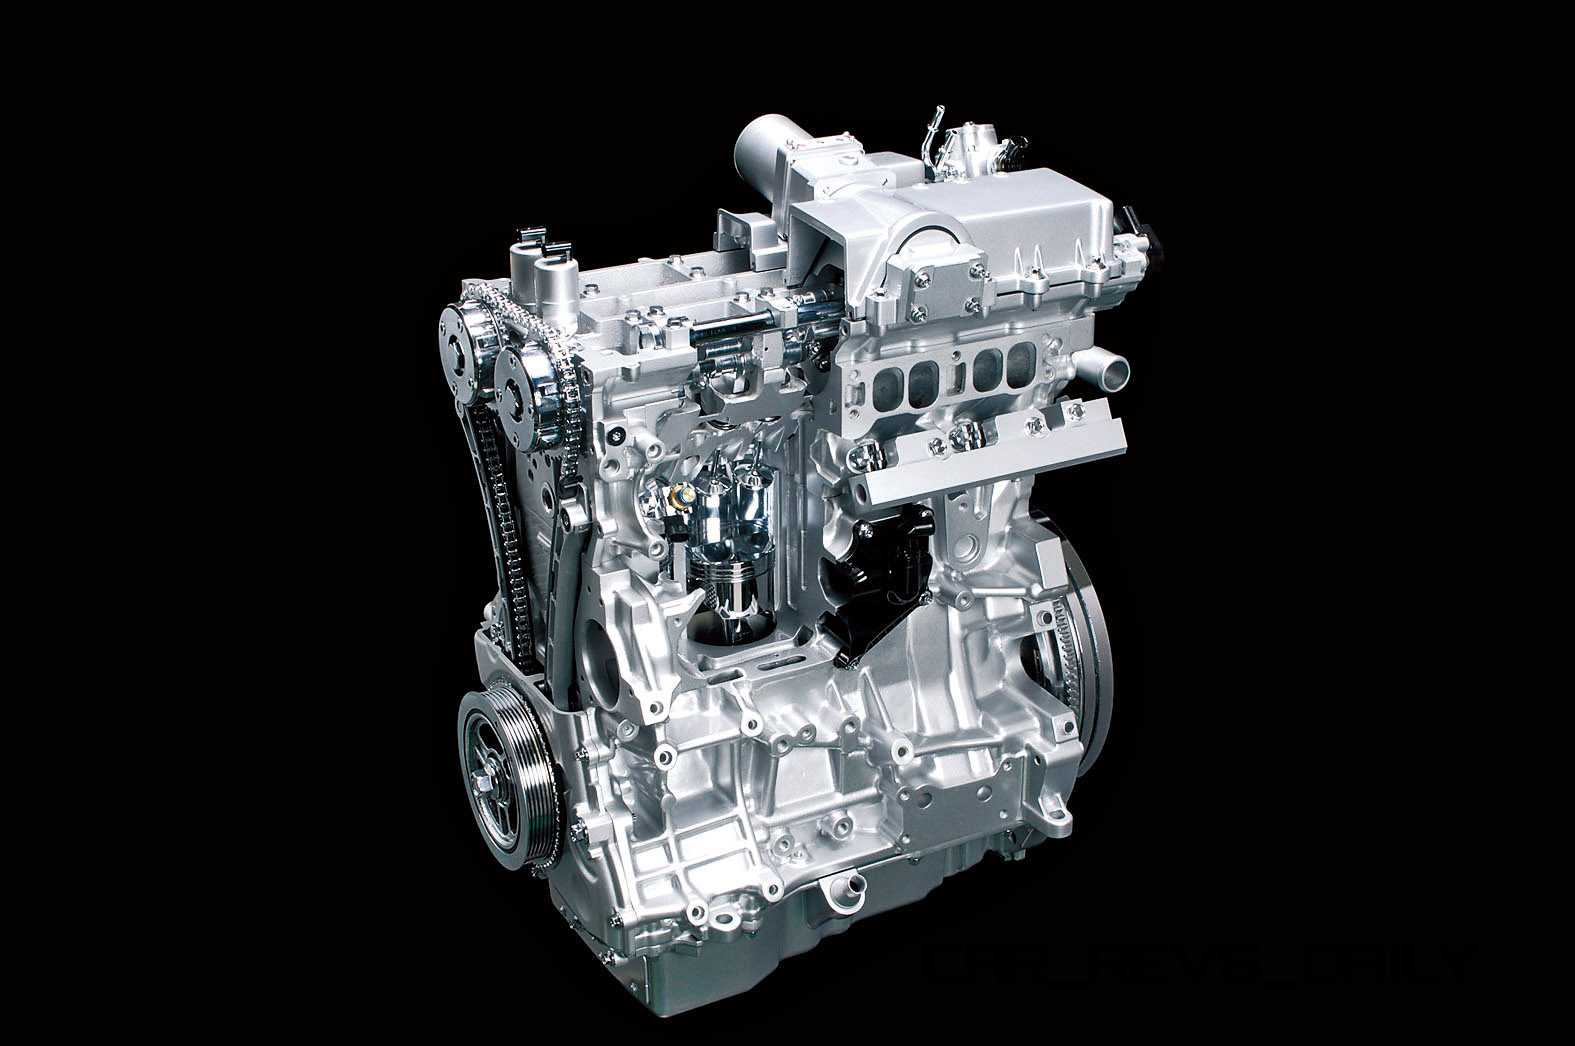 http://www.car-revs-daily.com/wp-content/uploads/2015/03/2008-Mazda-Kazamai-15.jpg